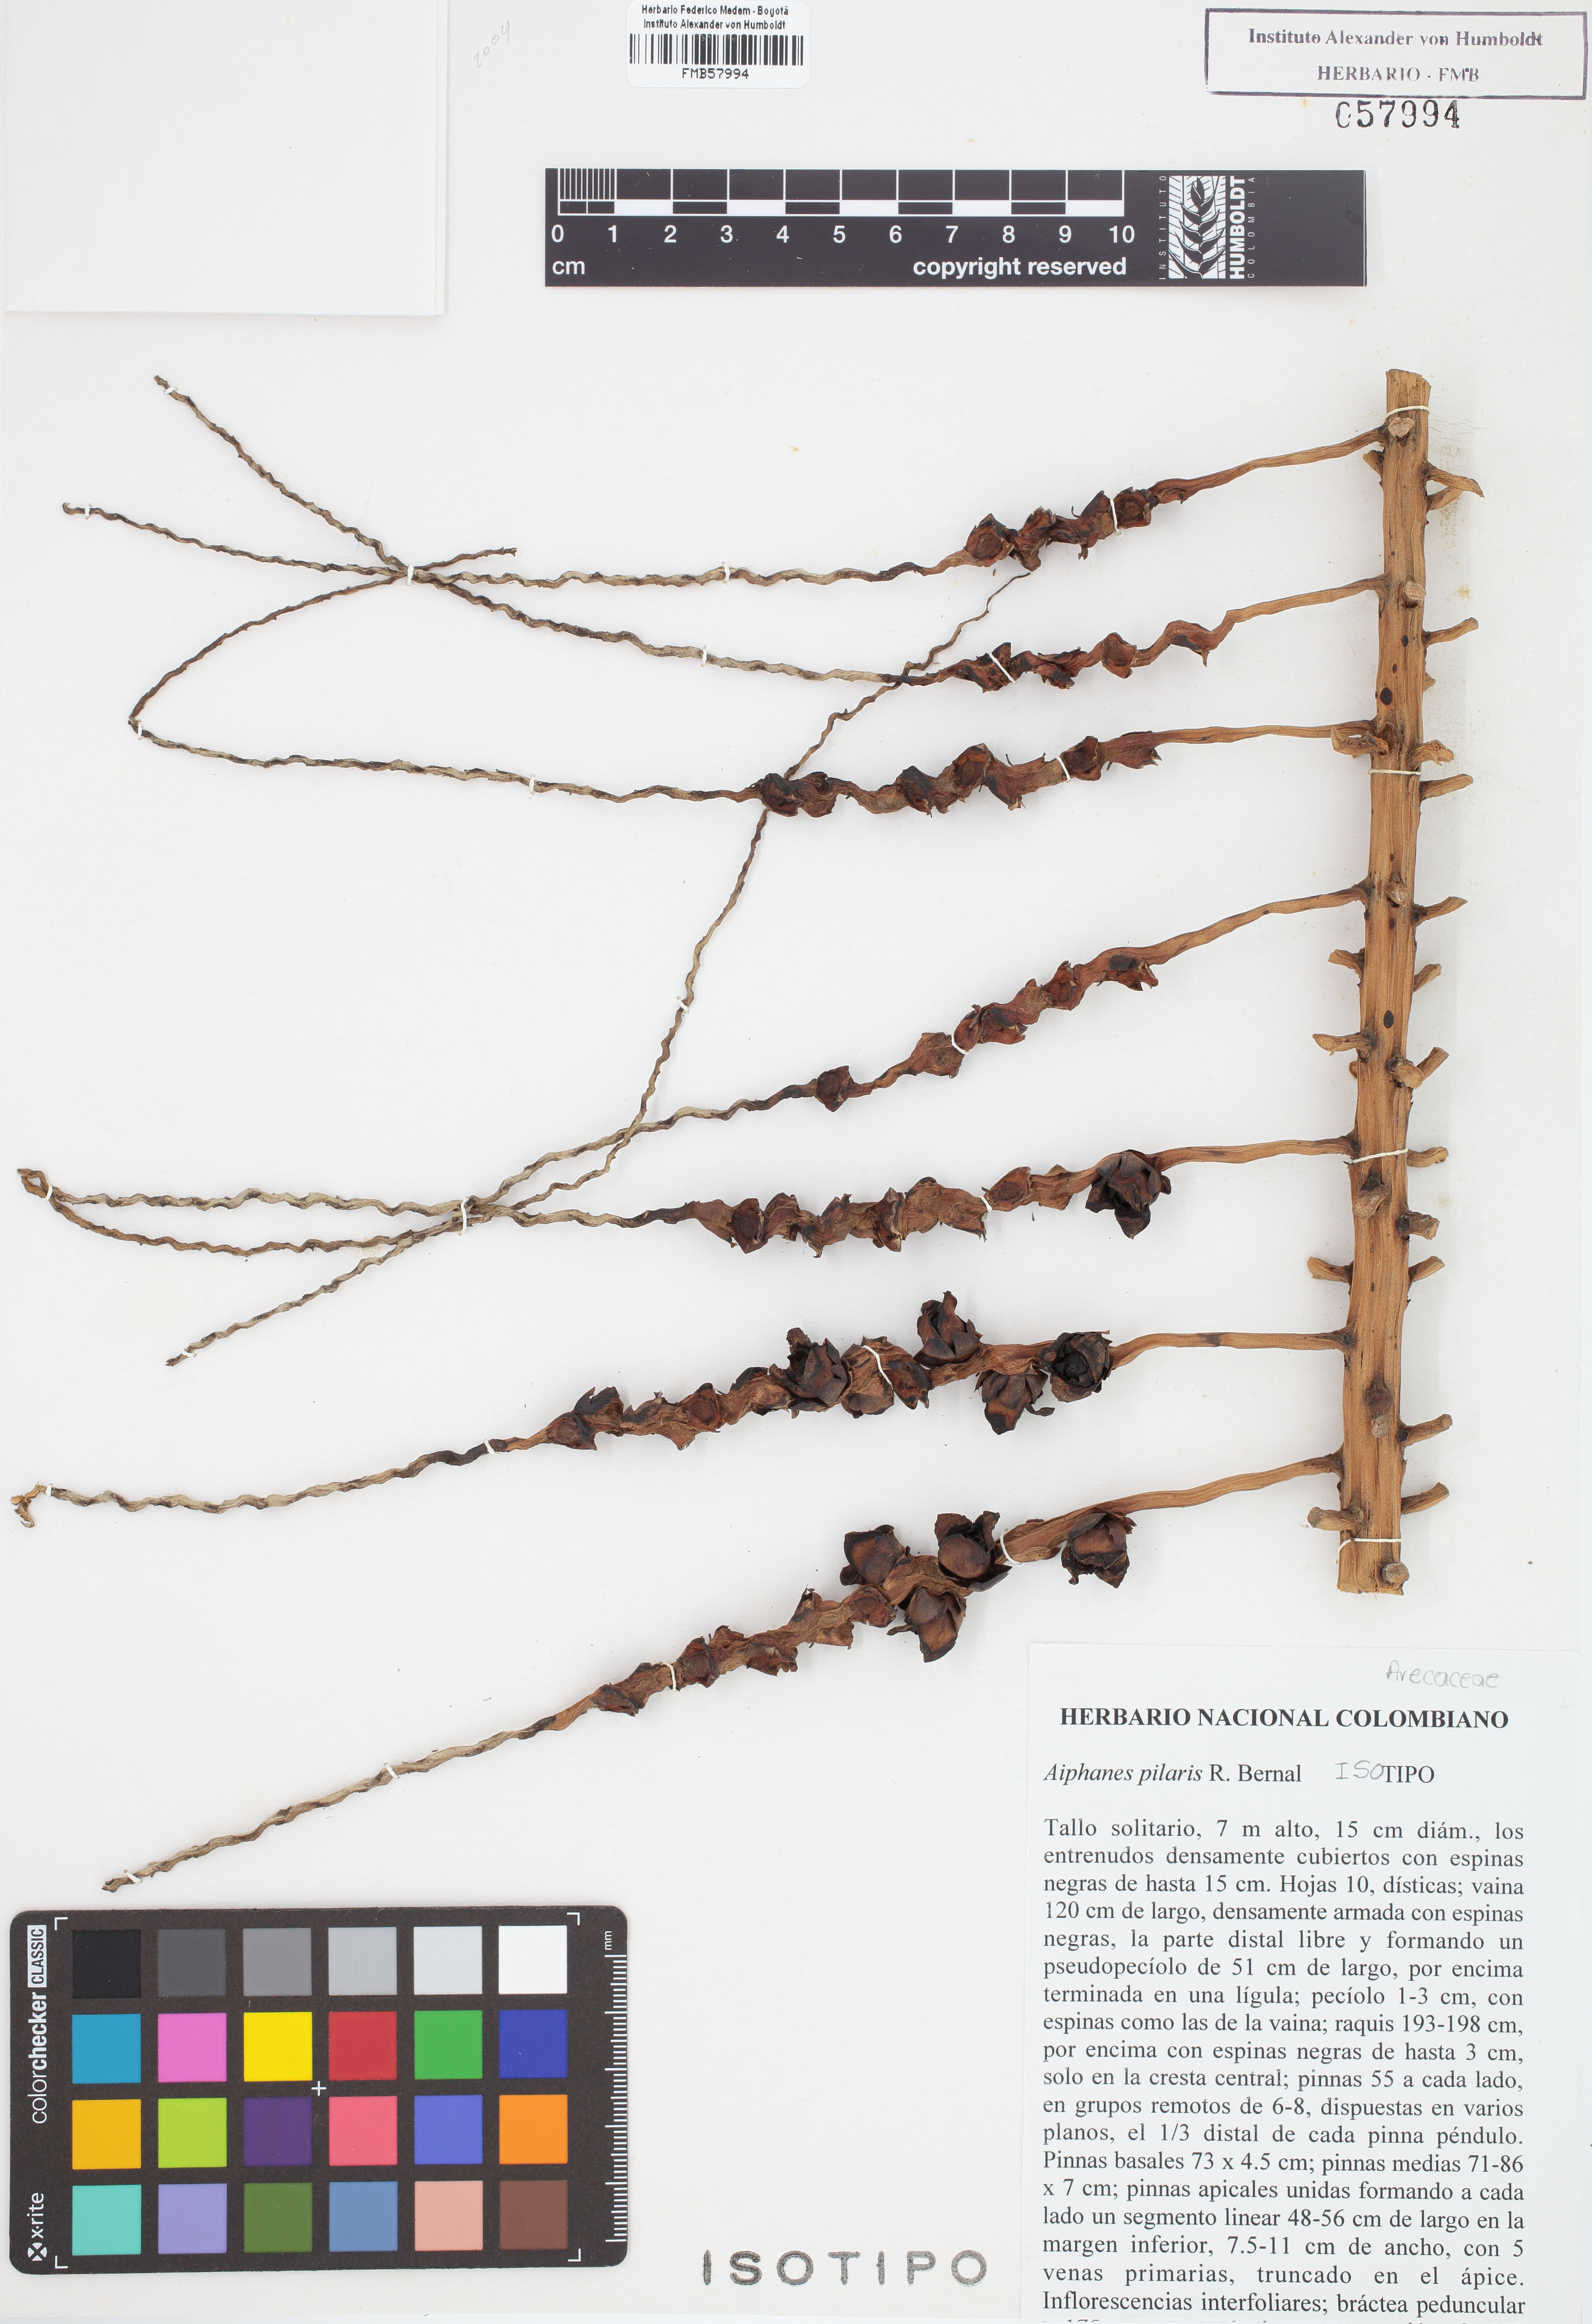 Isotipo de <em>Aiphanes pilaris</em>, FMB-57994, Fotografía por Robles A.